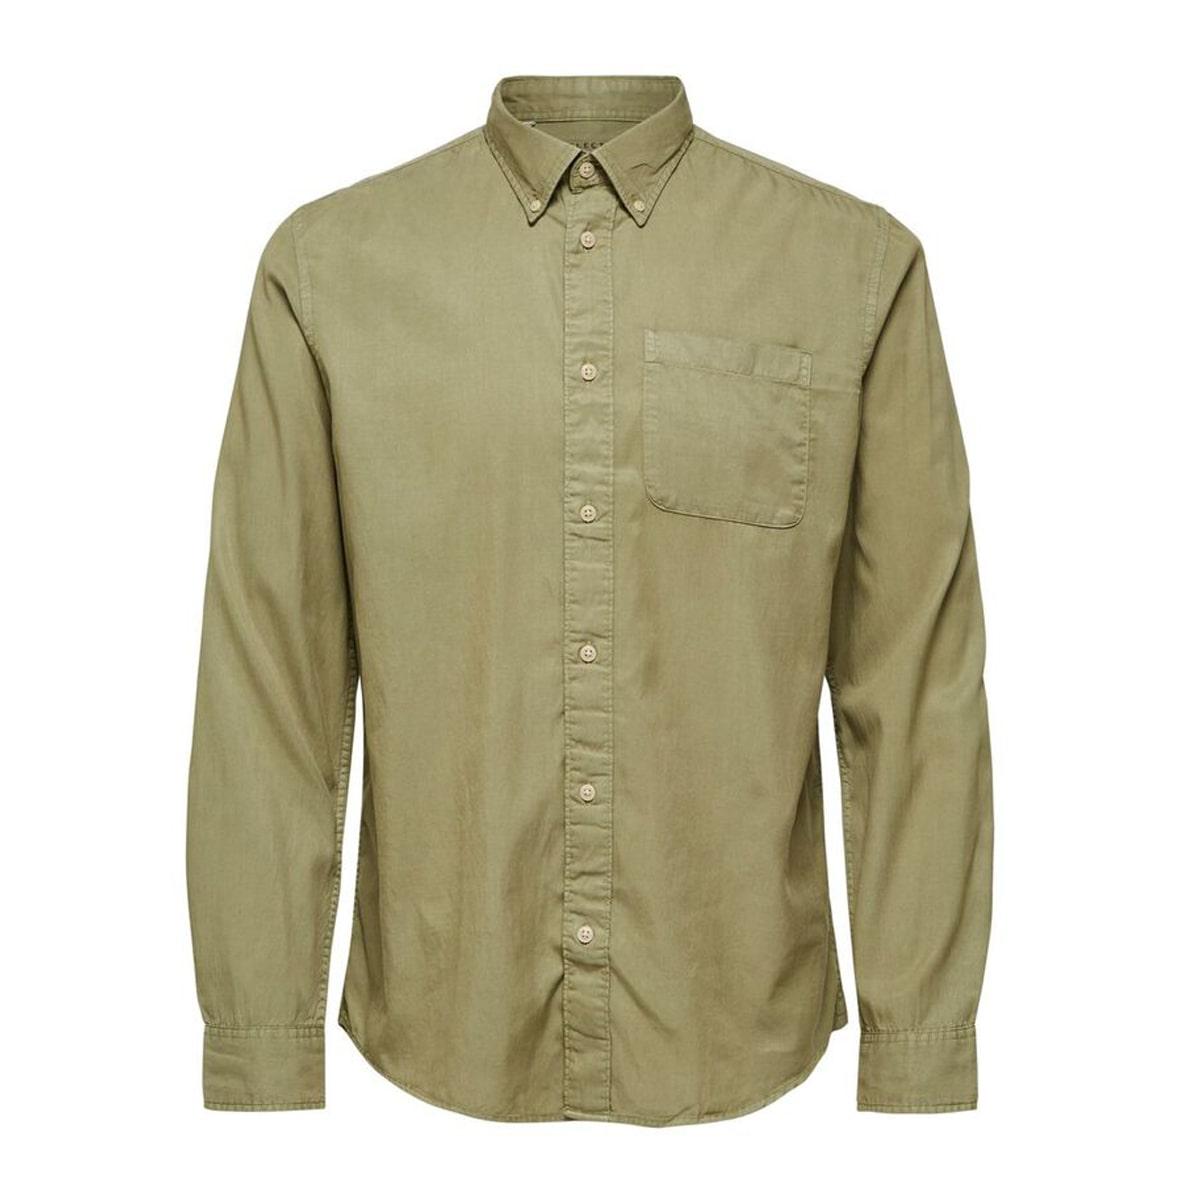 Soft Tencel Lyocell Aloe Shirt by Selected Homme | Restoration Yard